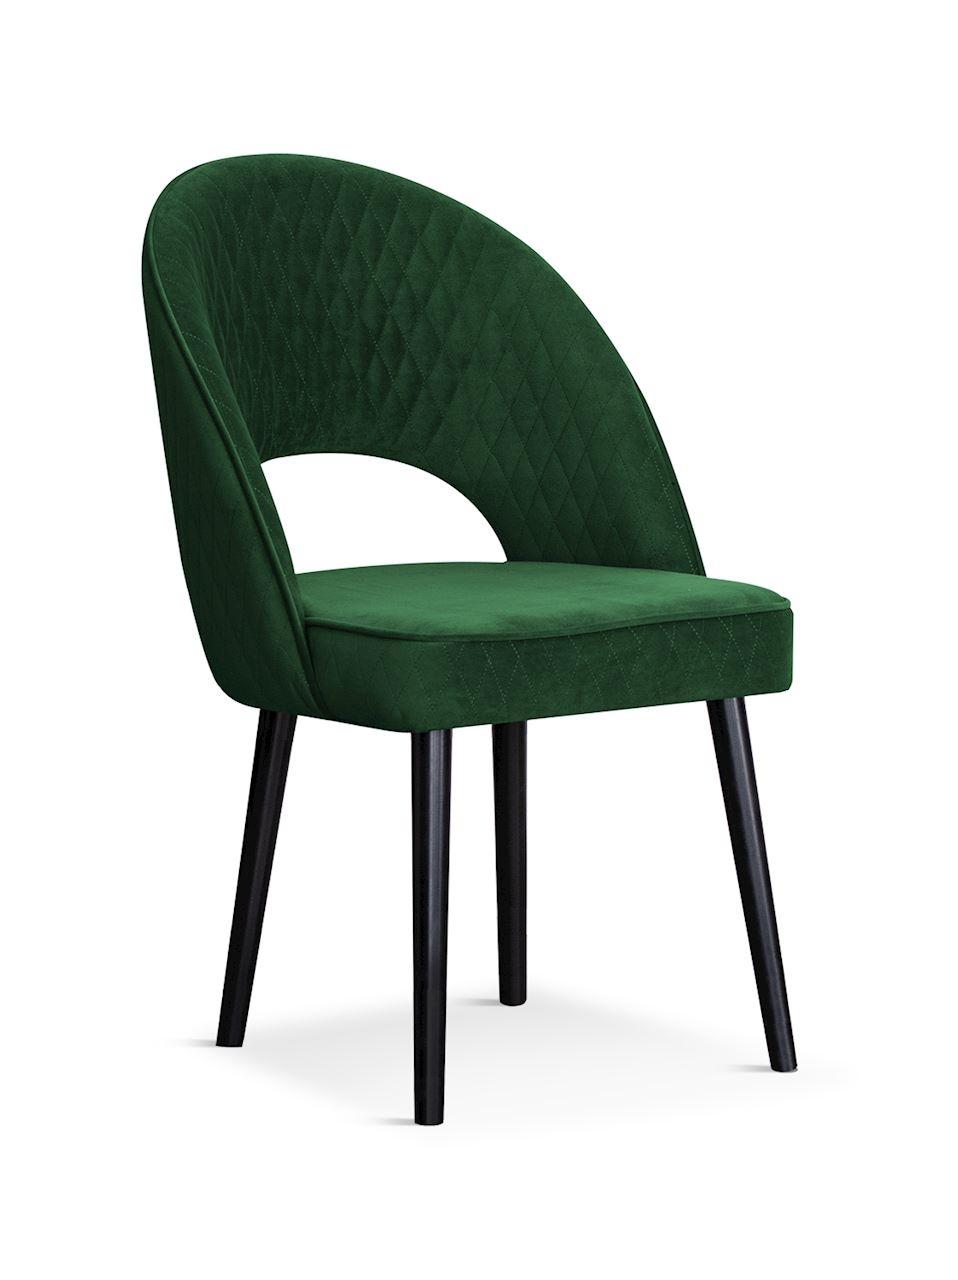 Scaun tapitat cu stofa si picioare din lemn Ponte Velvet Verde / Negru, l56xA63xH89 cm